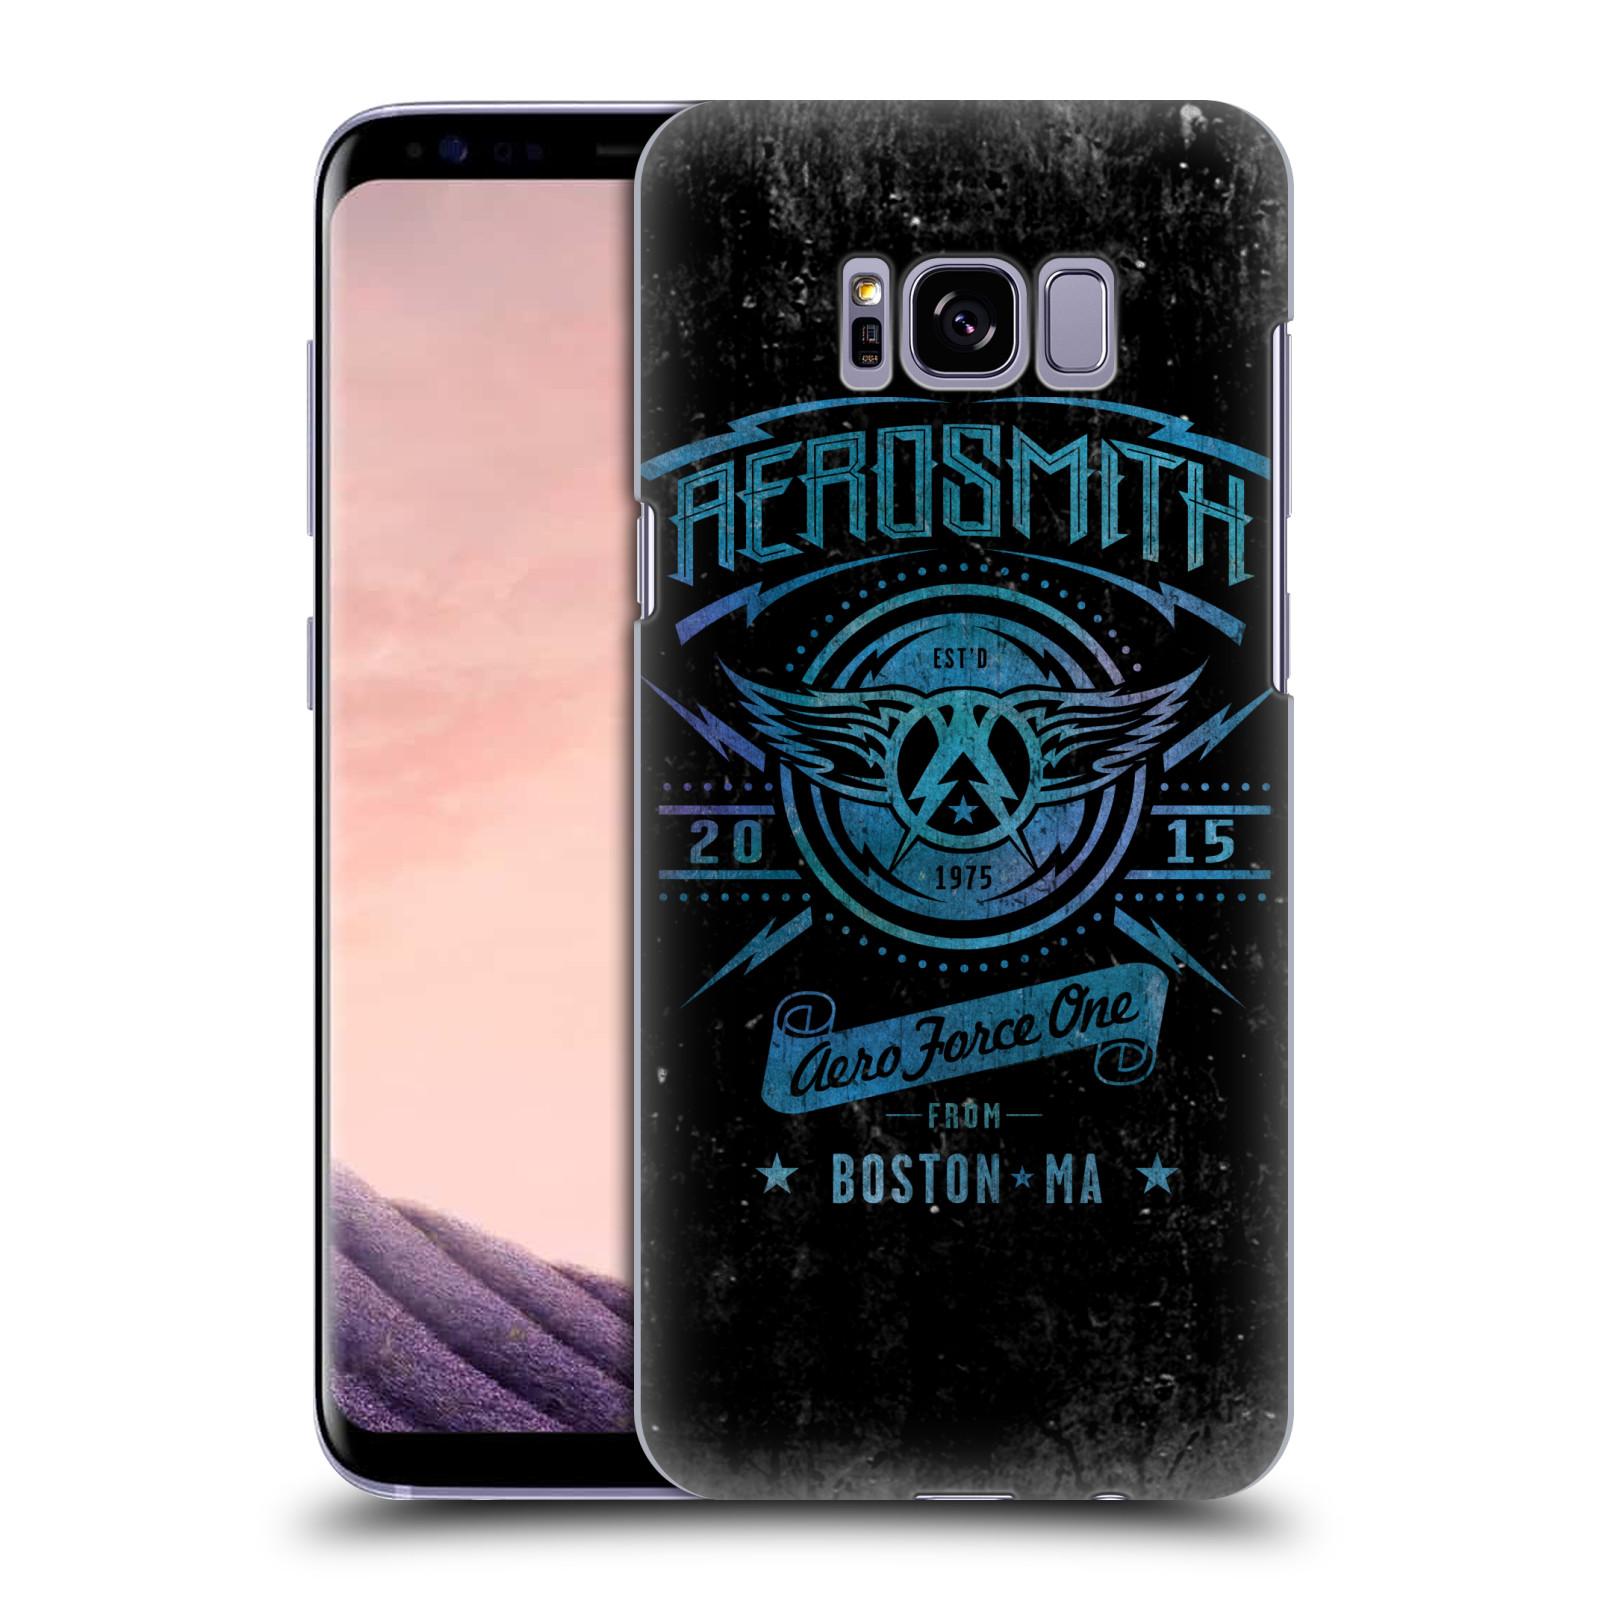 Plastové pouzdro na mobil Samsung Galaxy S8+ (Plus) Head Case - Aerosmith - Aero Force One